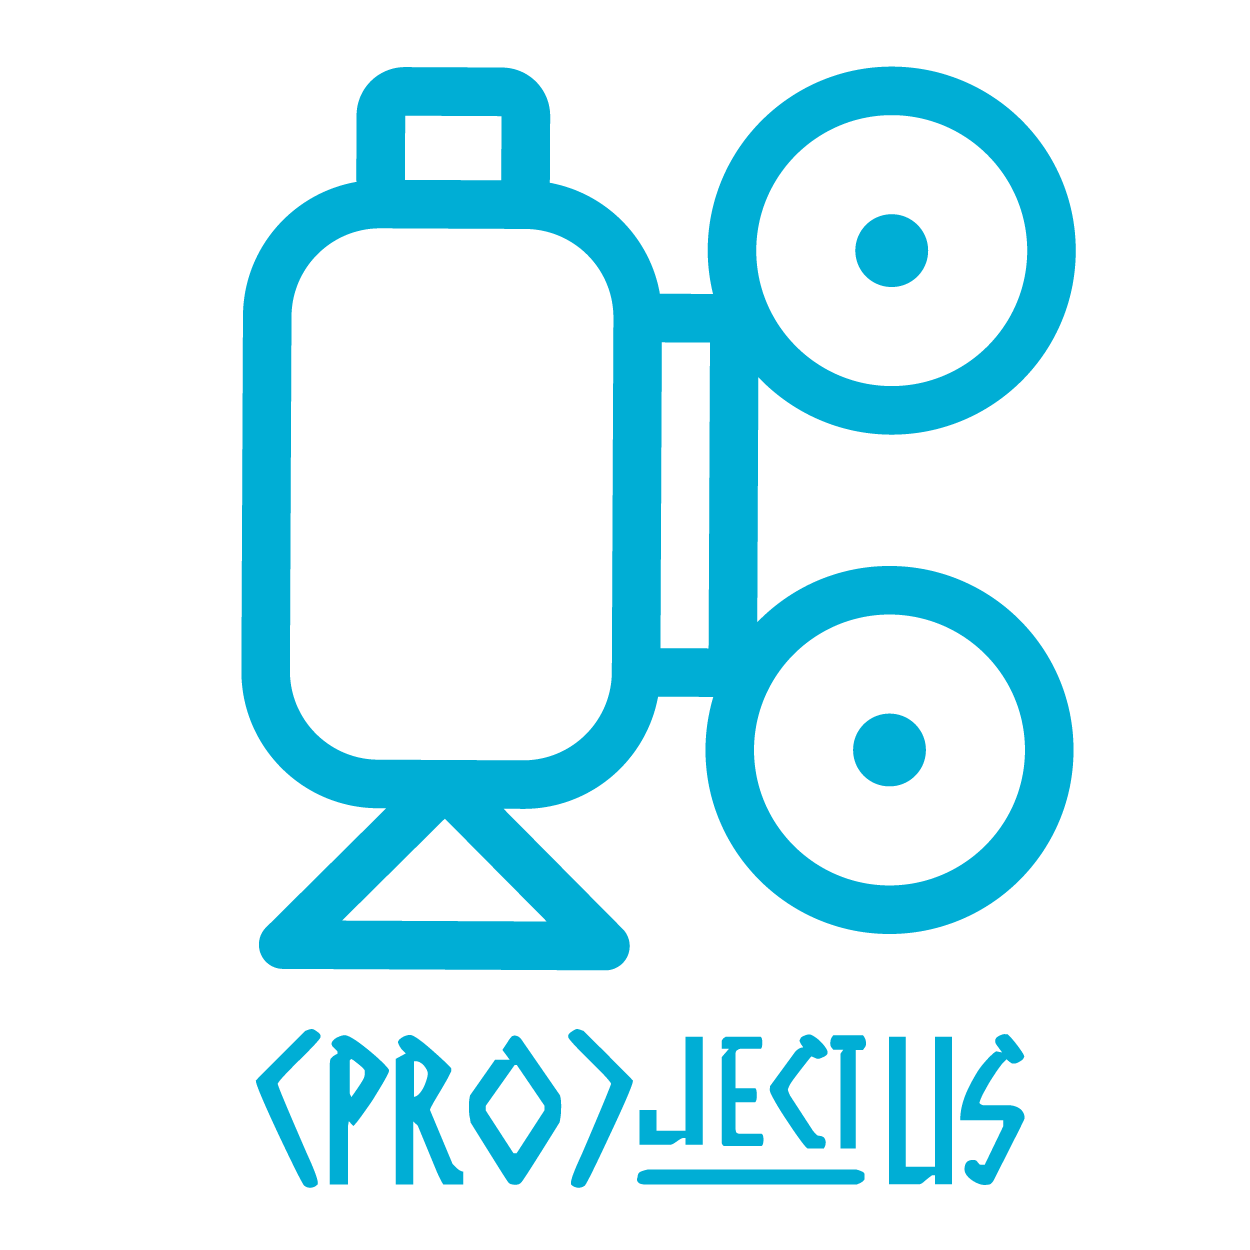 (PRO)jectUS